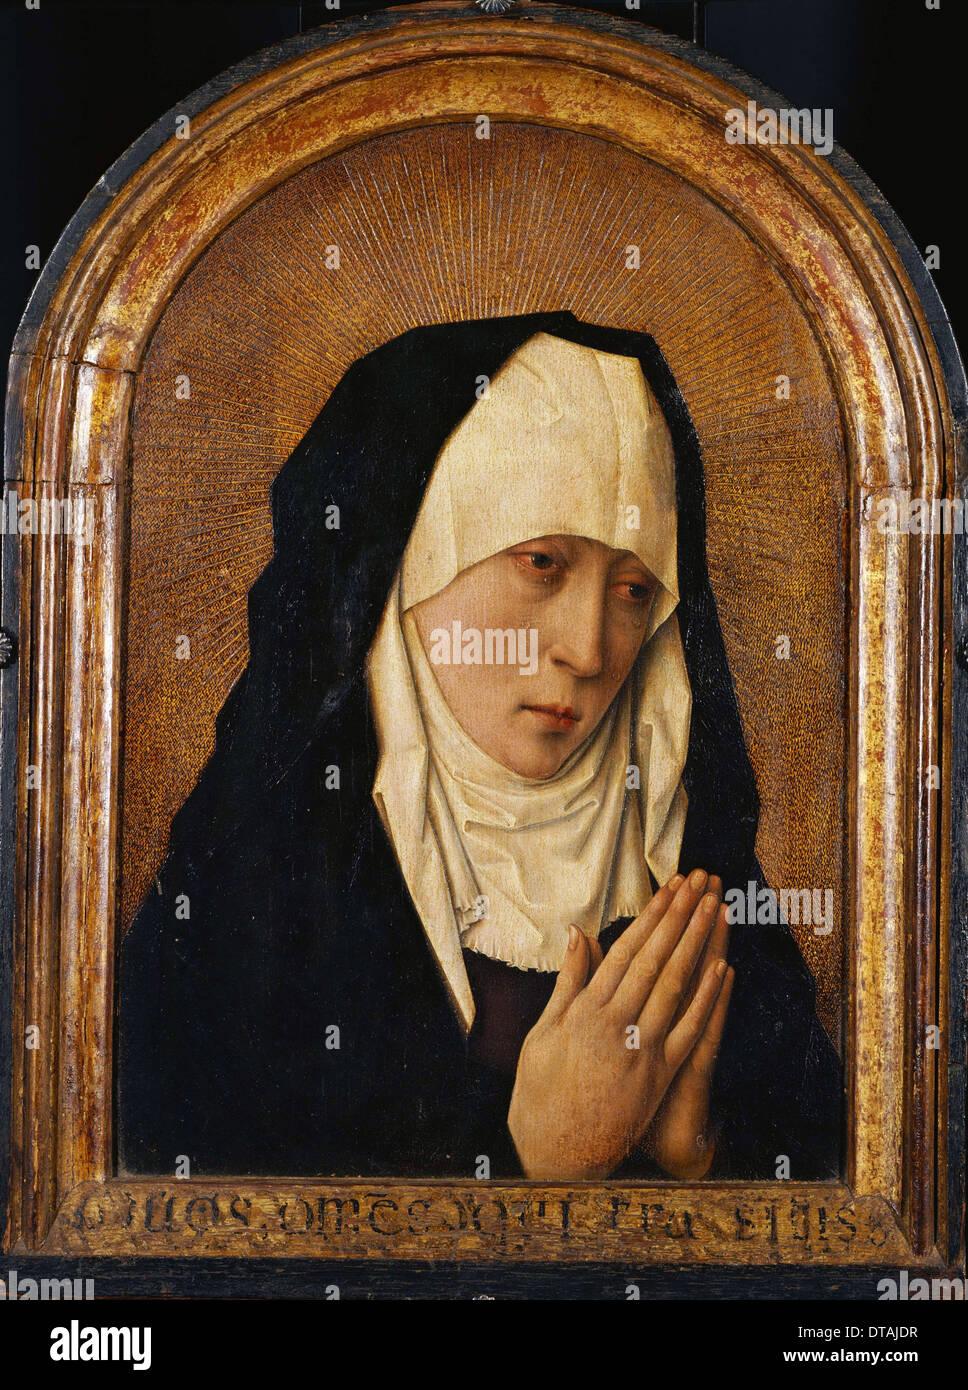 Mater Dolorosa. Artist: Bouts, Dirk (1410/20-1475) - Stock Image